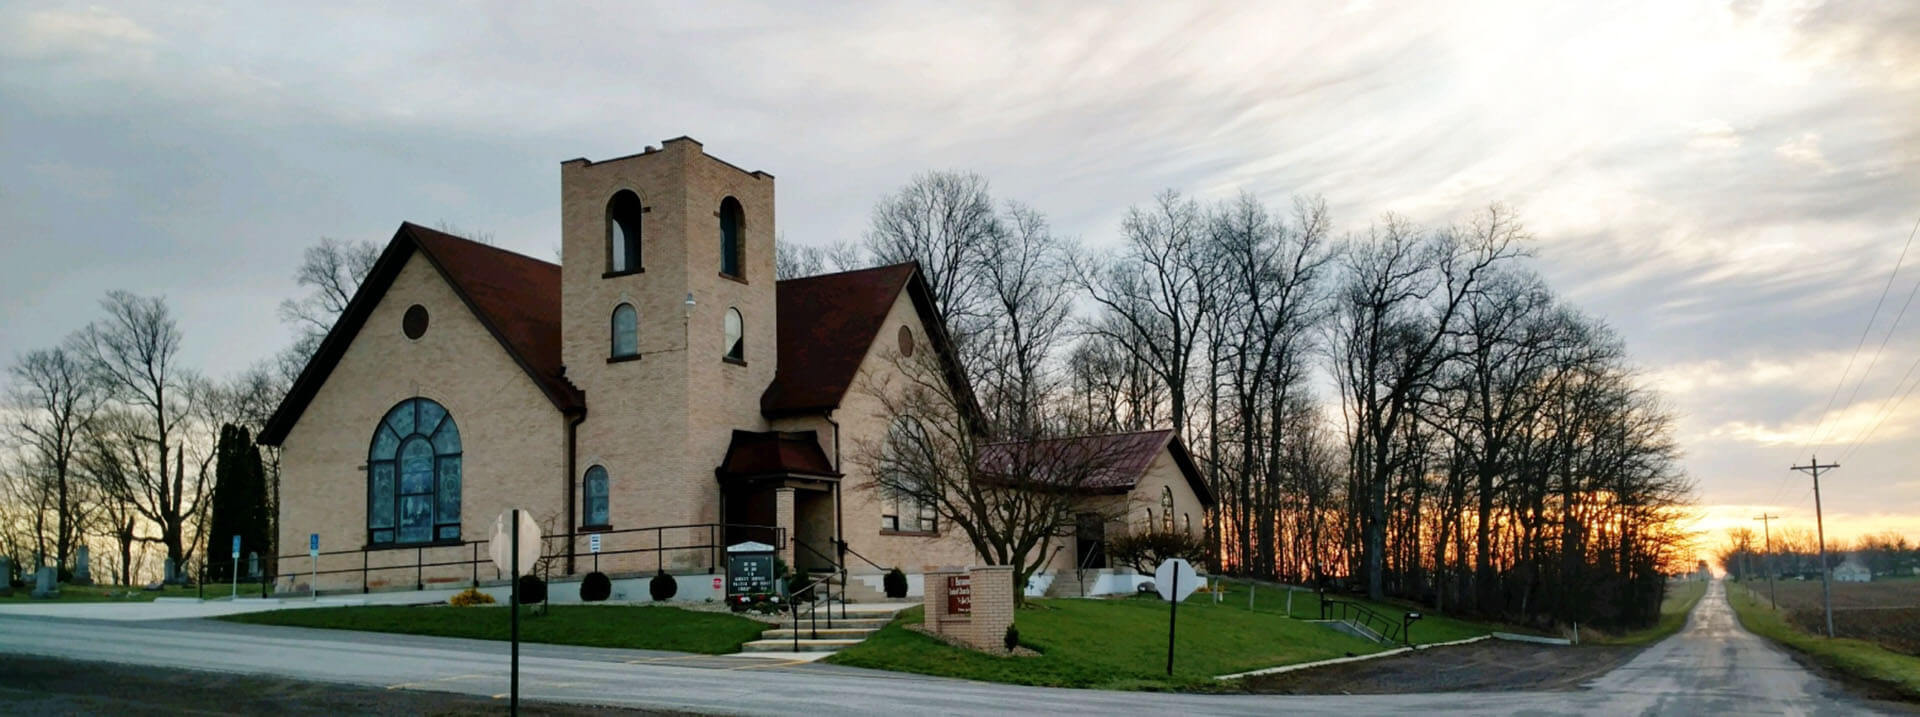 mud-church-1